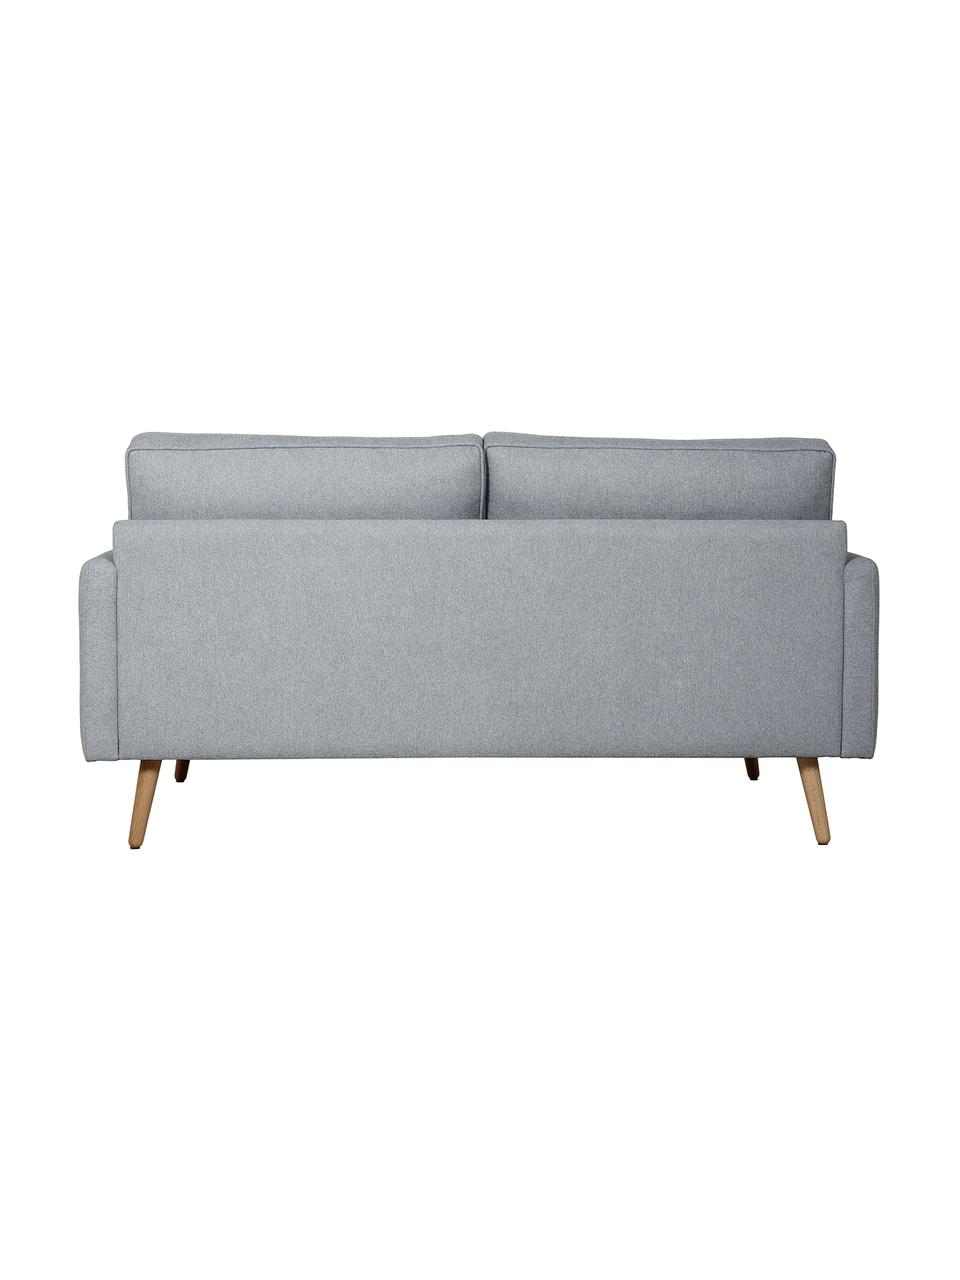 Sofa Saint (2-Sitzer) in Blaugrau mit Eichenholz-Füßen, Bezug: Polyester Der hochwertige, Gestell: Massives Kiefernholz, Spa, Webstoff Blaugrau, B 169 x T 93 cm